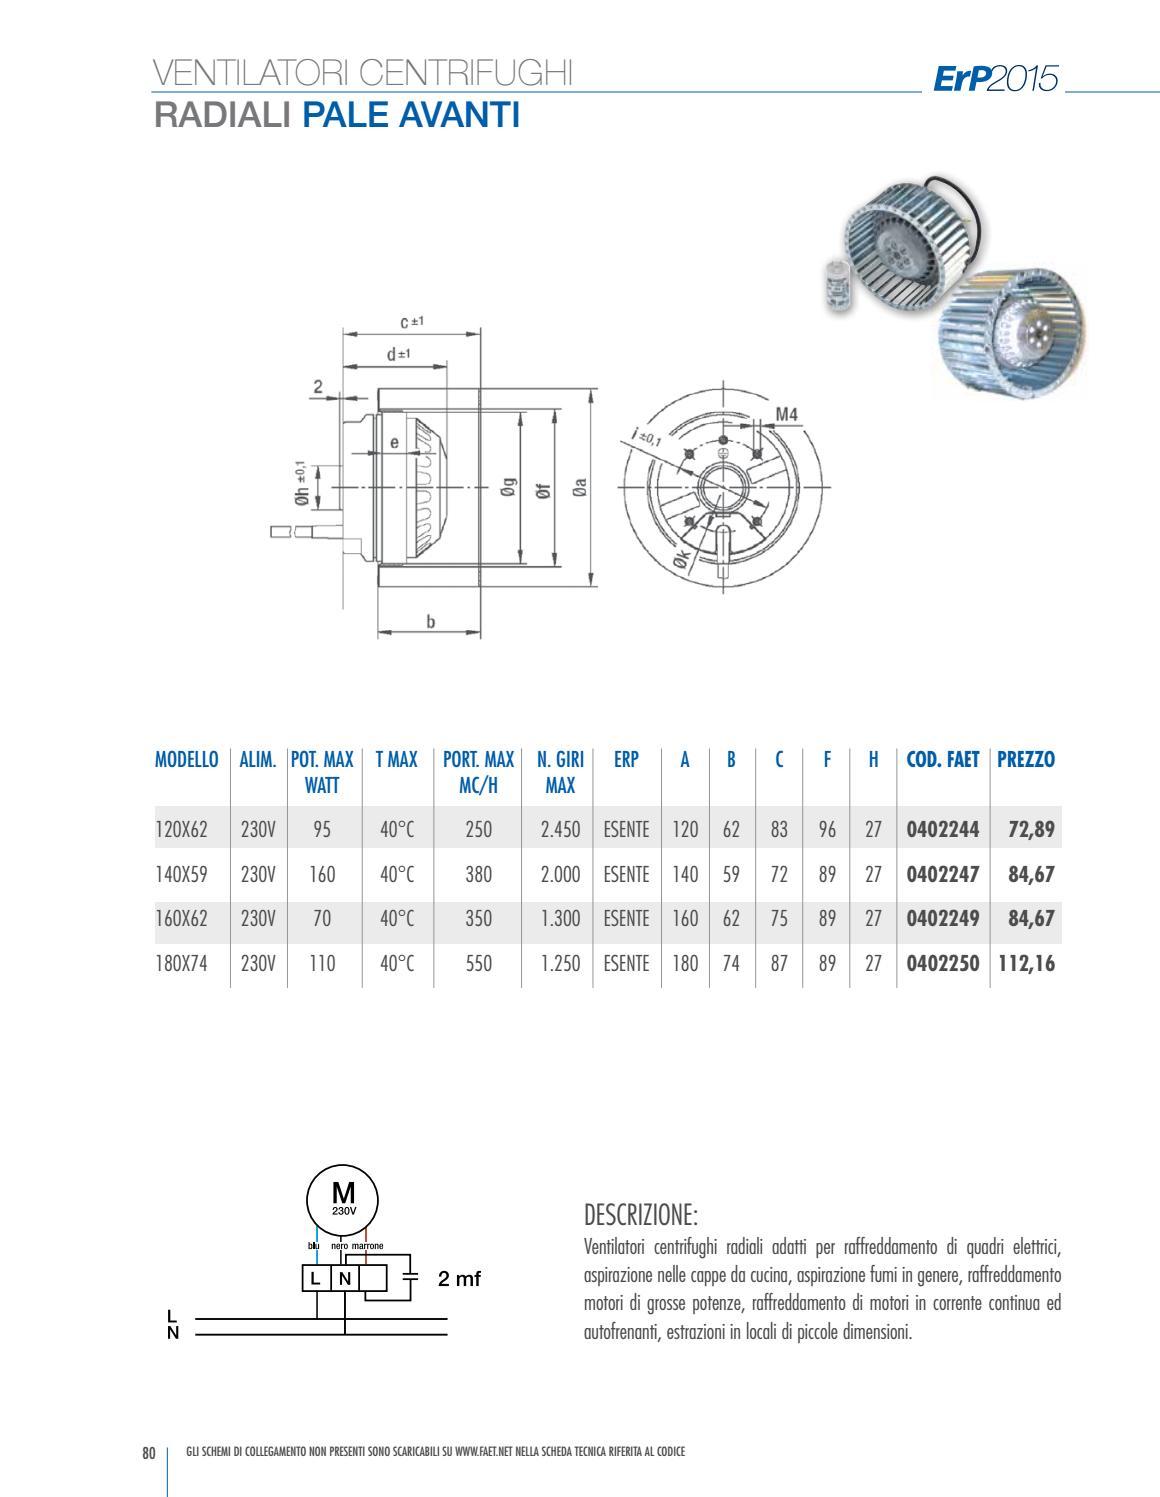 Schema Elettrico Max 250 : Faet 2015 catalogo ventilatori centrifughi by simone banfi issuu